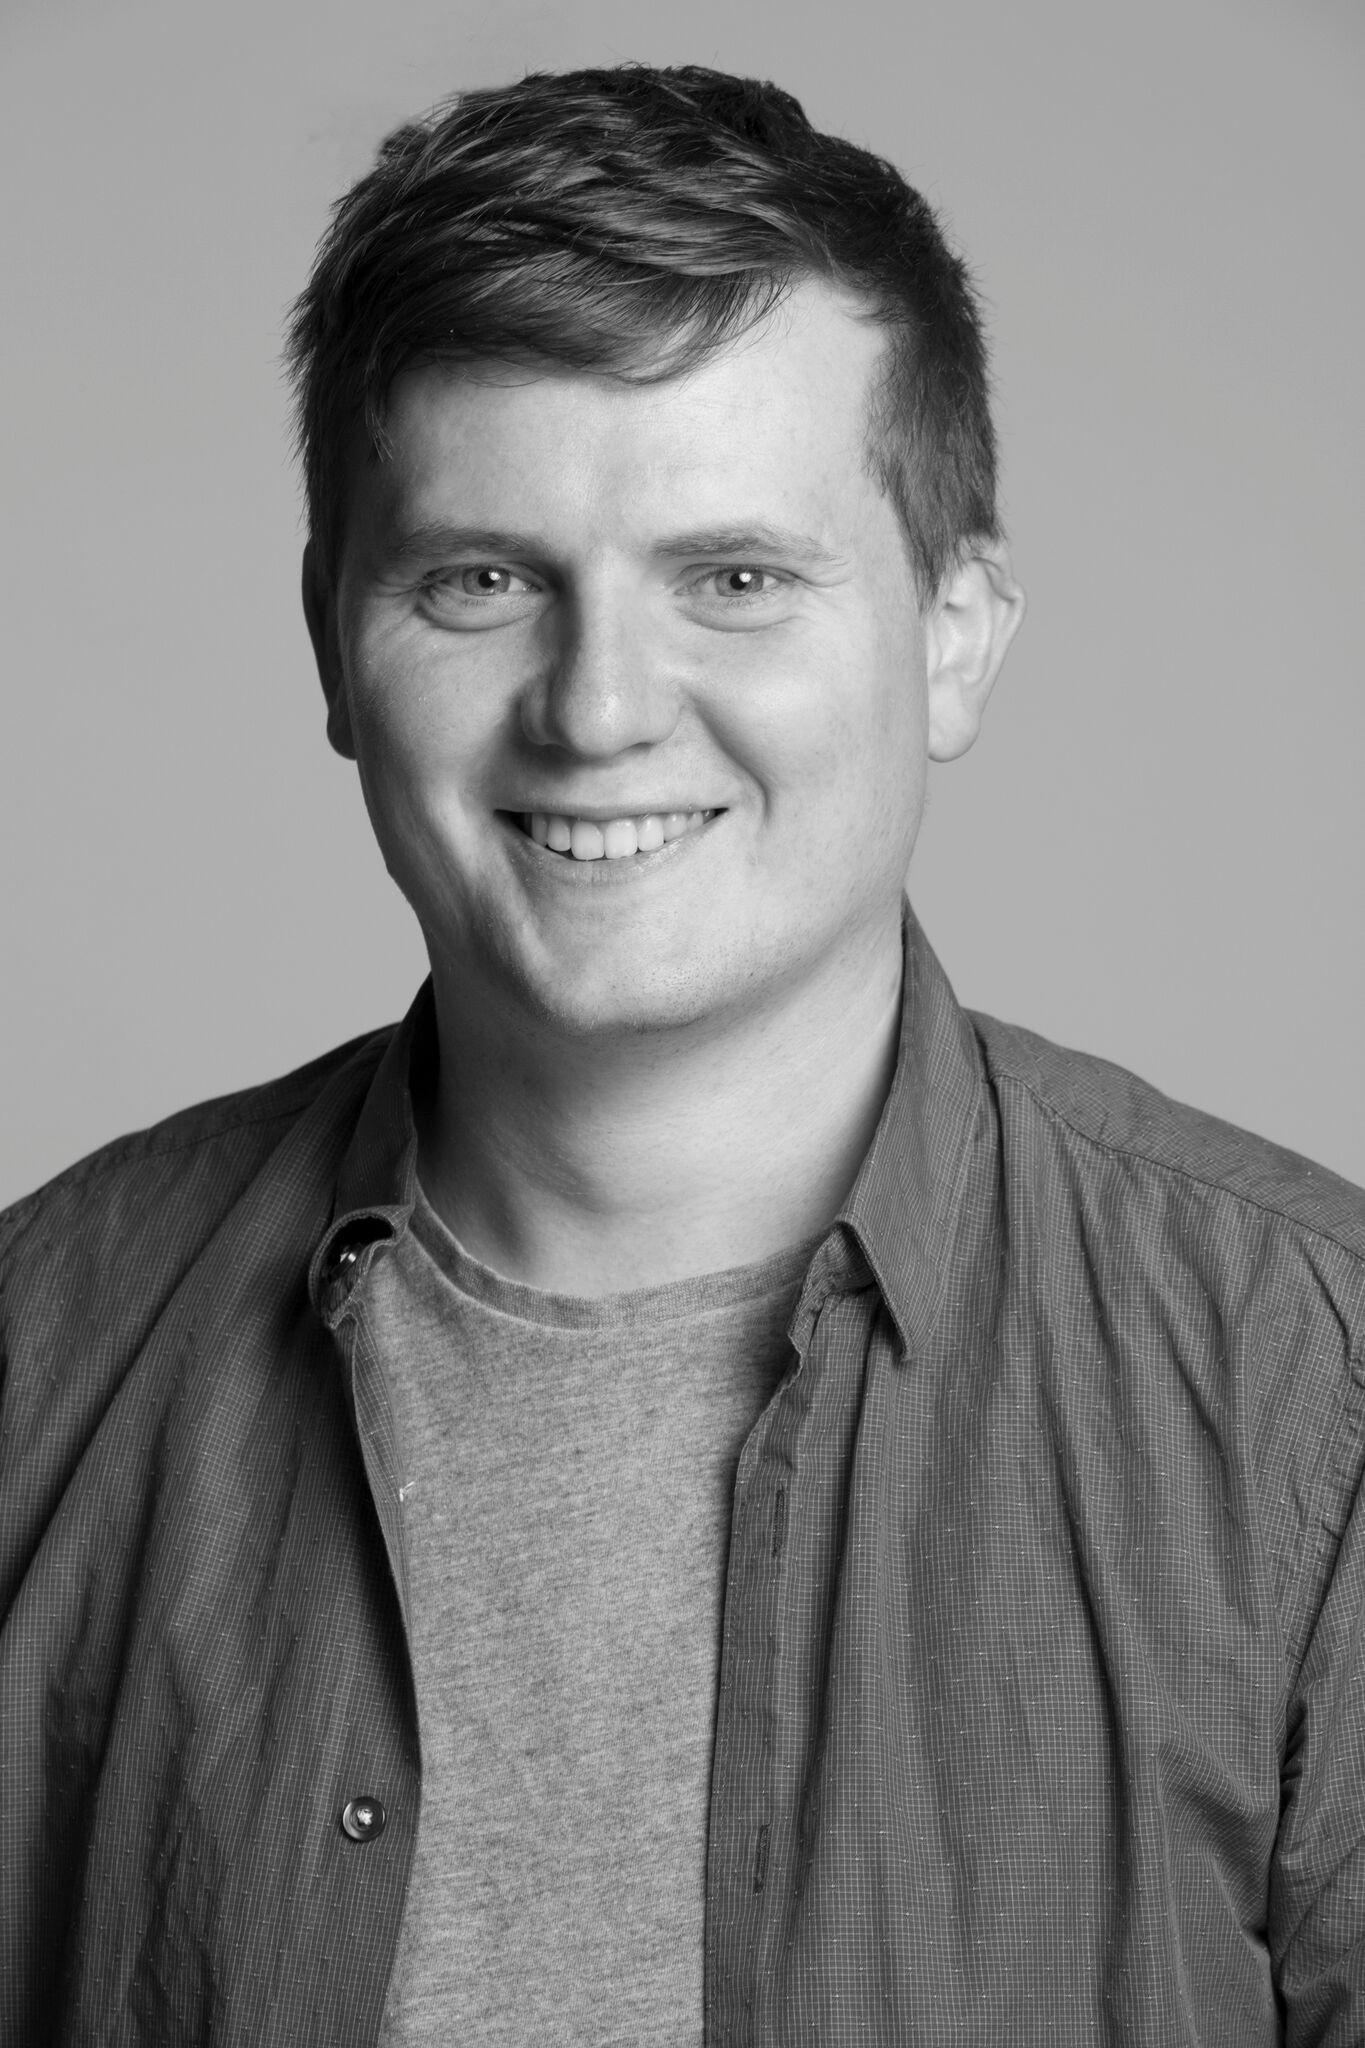 Eoghan McKenna